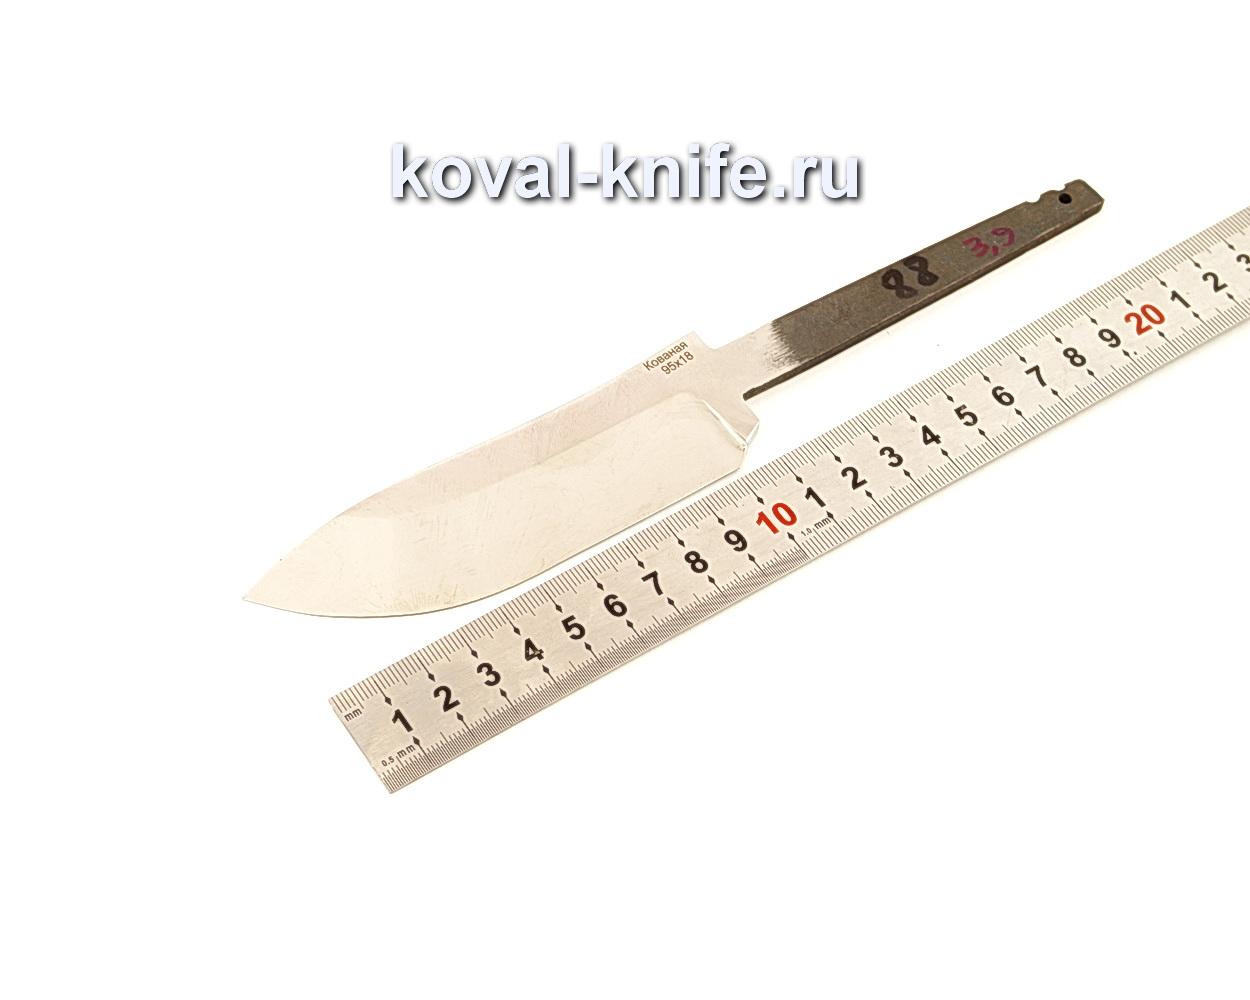 Клинок для ножа из кованой 95Х18 N88